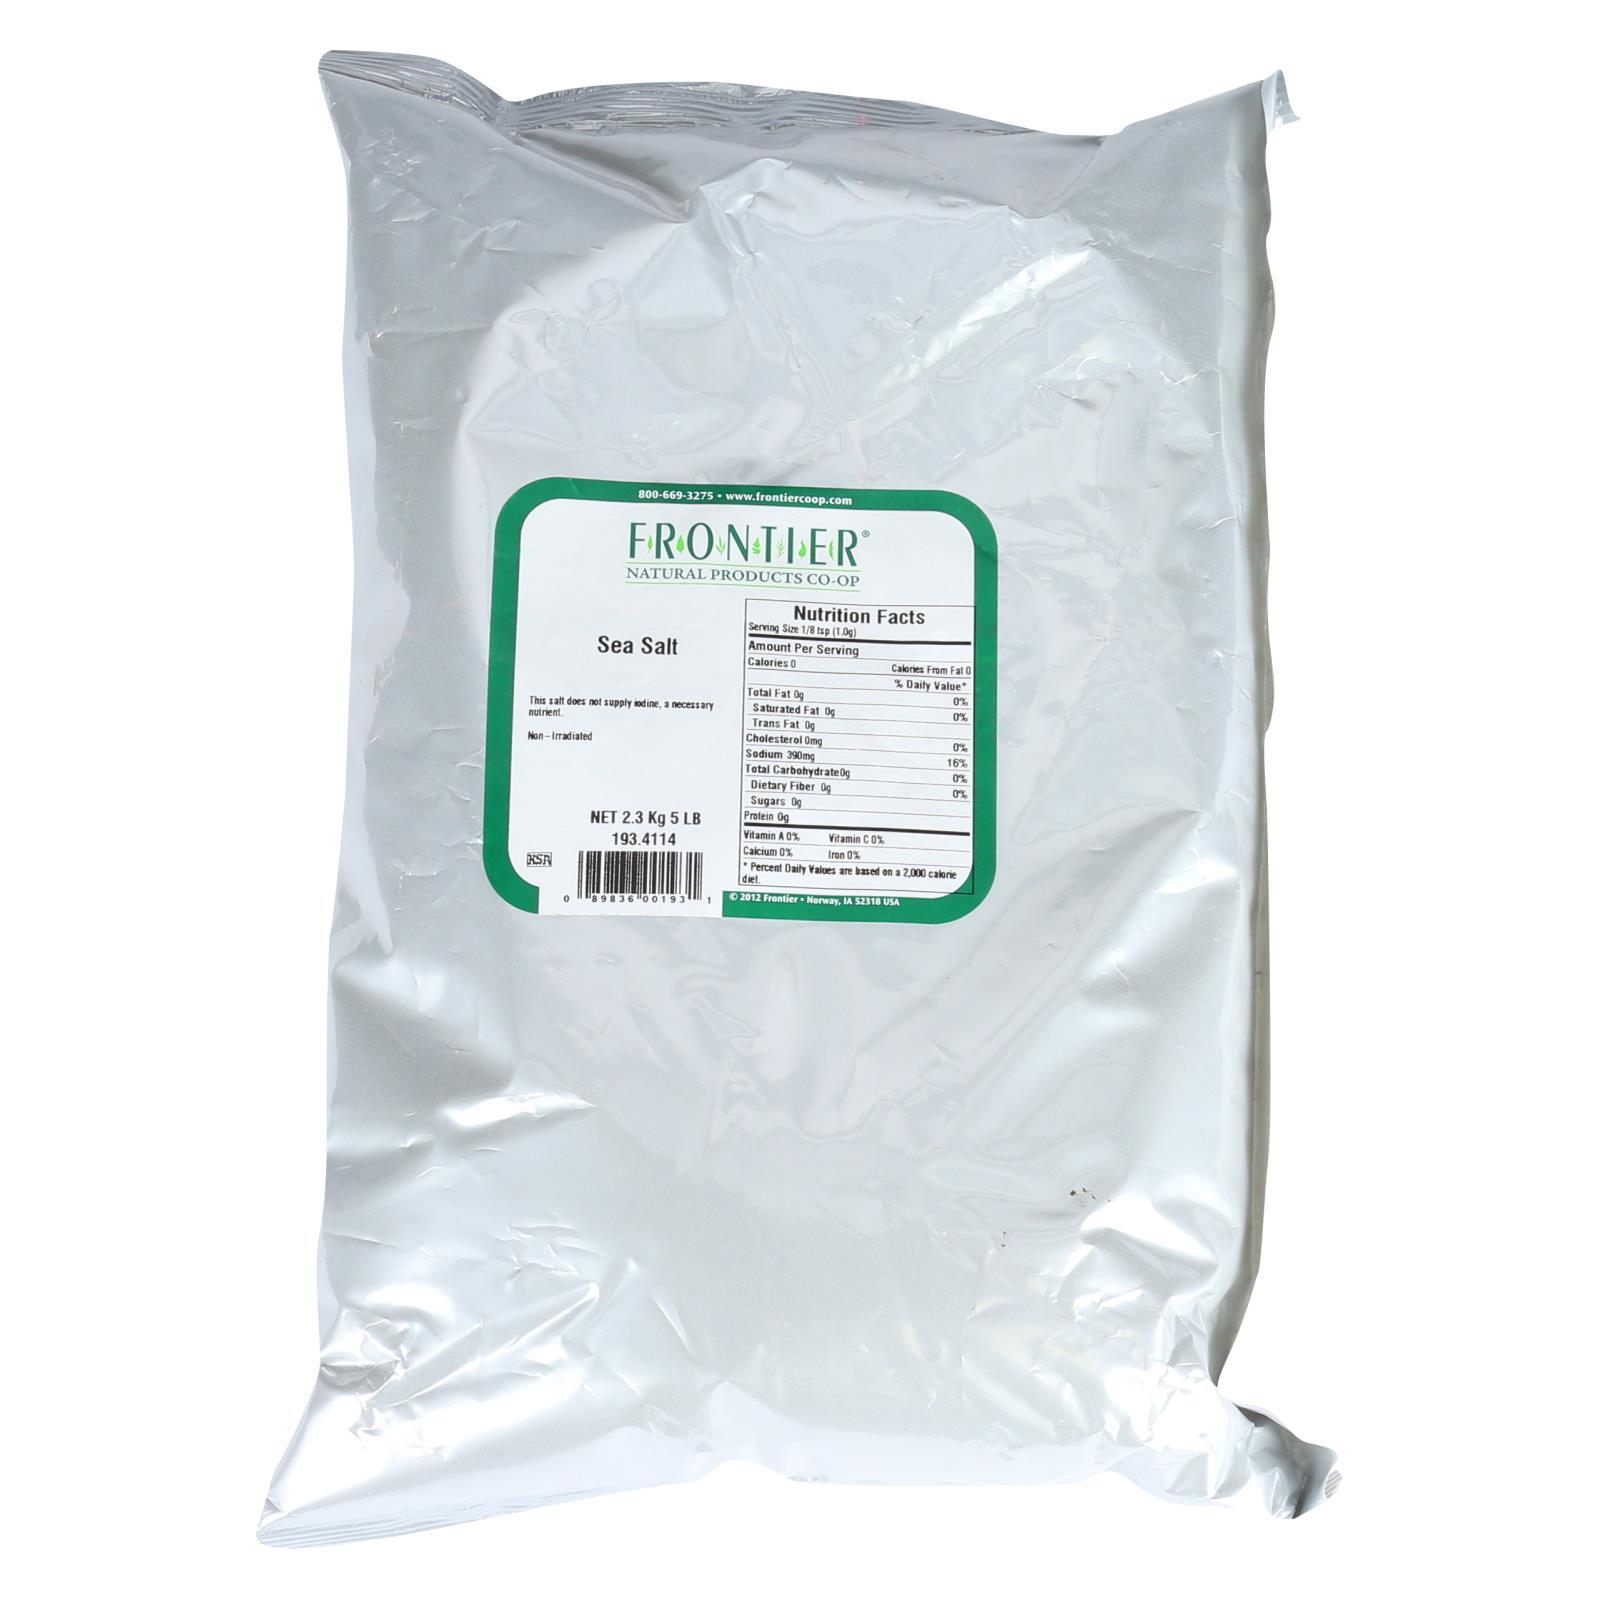 Frontier Herb Sea Salt - Table Grind - Bulk - 5 lbs